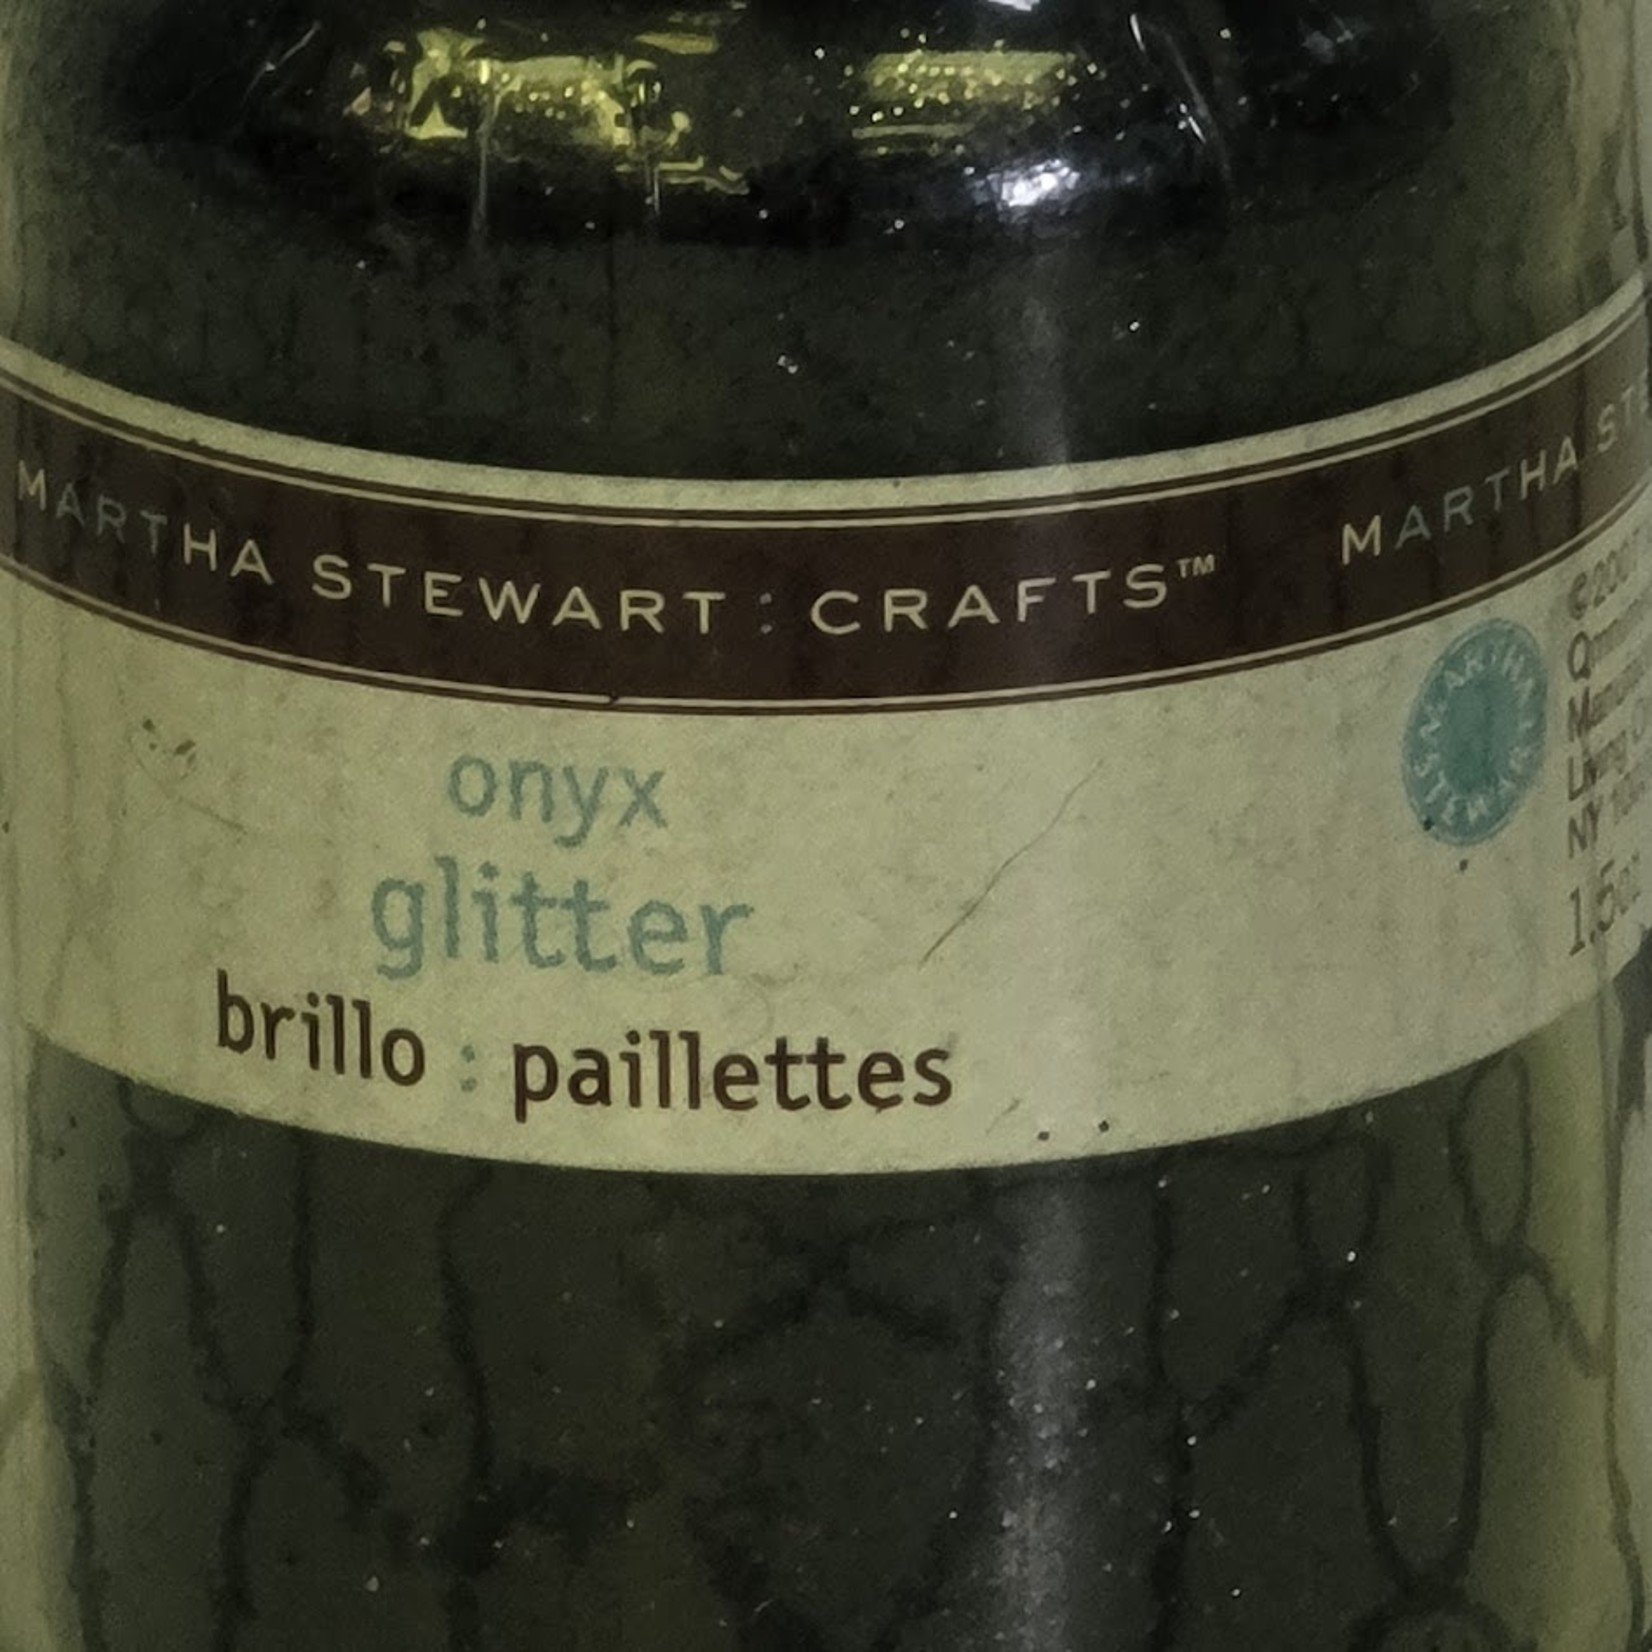 Martha Stewart Martha Stewart Crafts - Glitter - Onyx